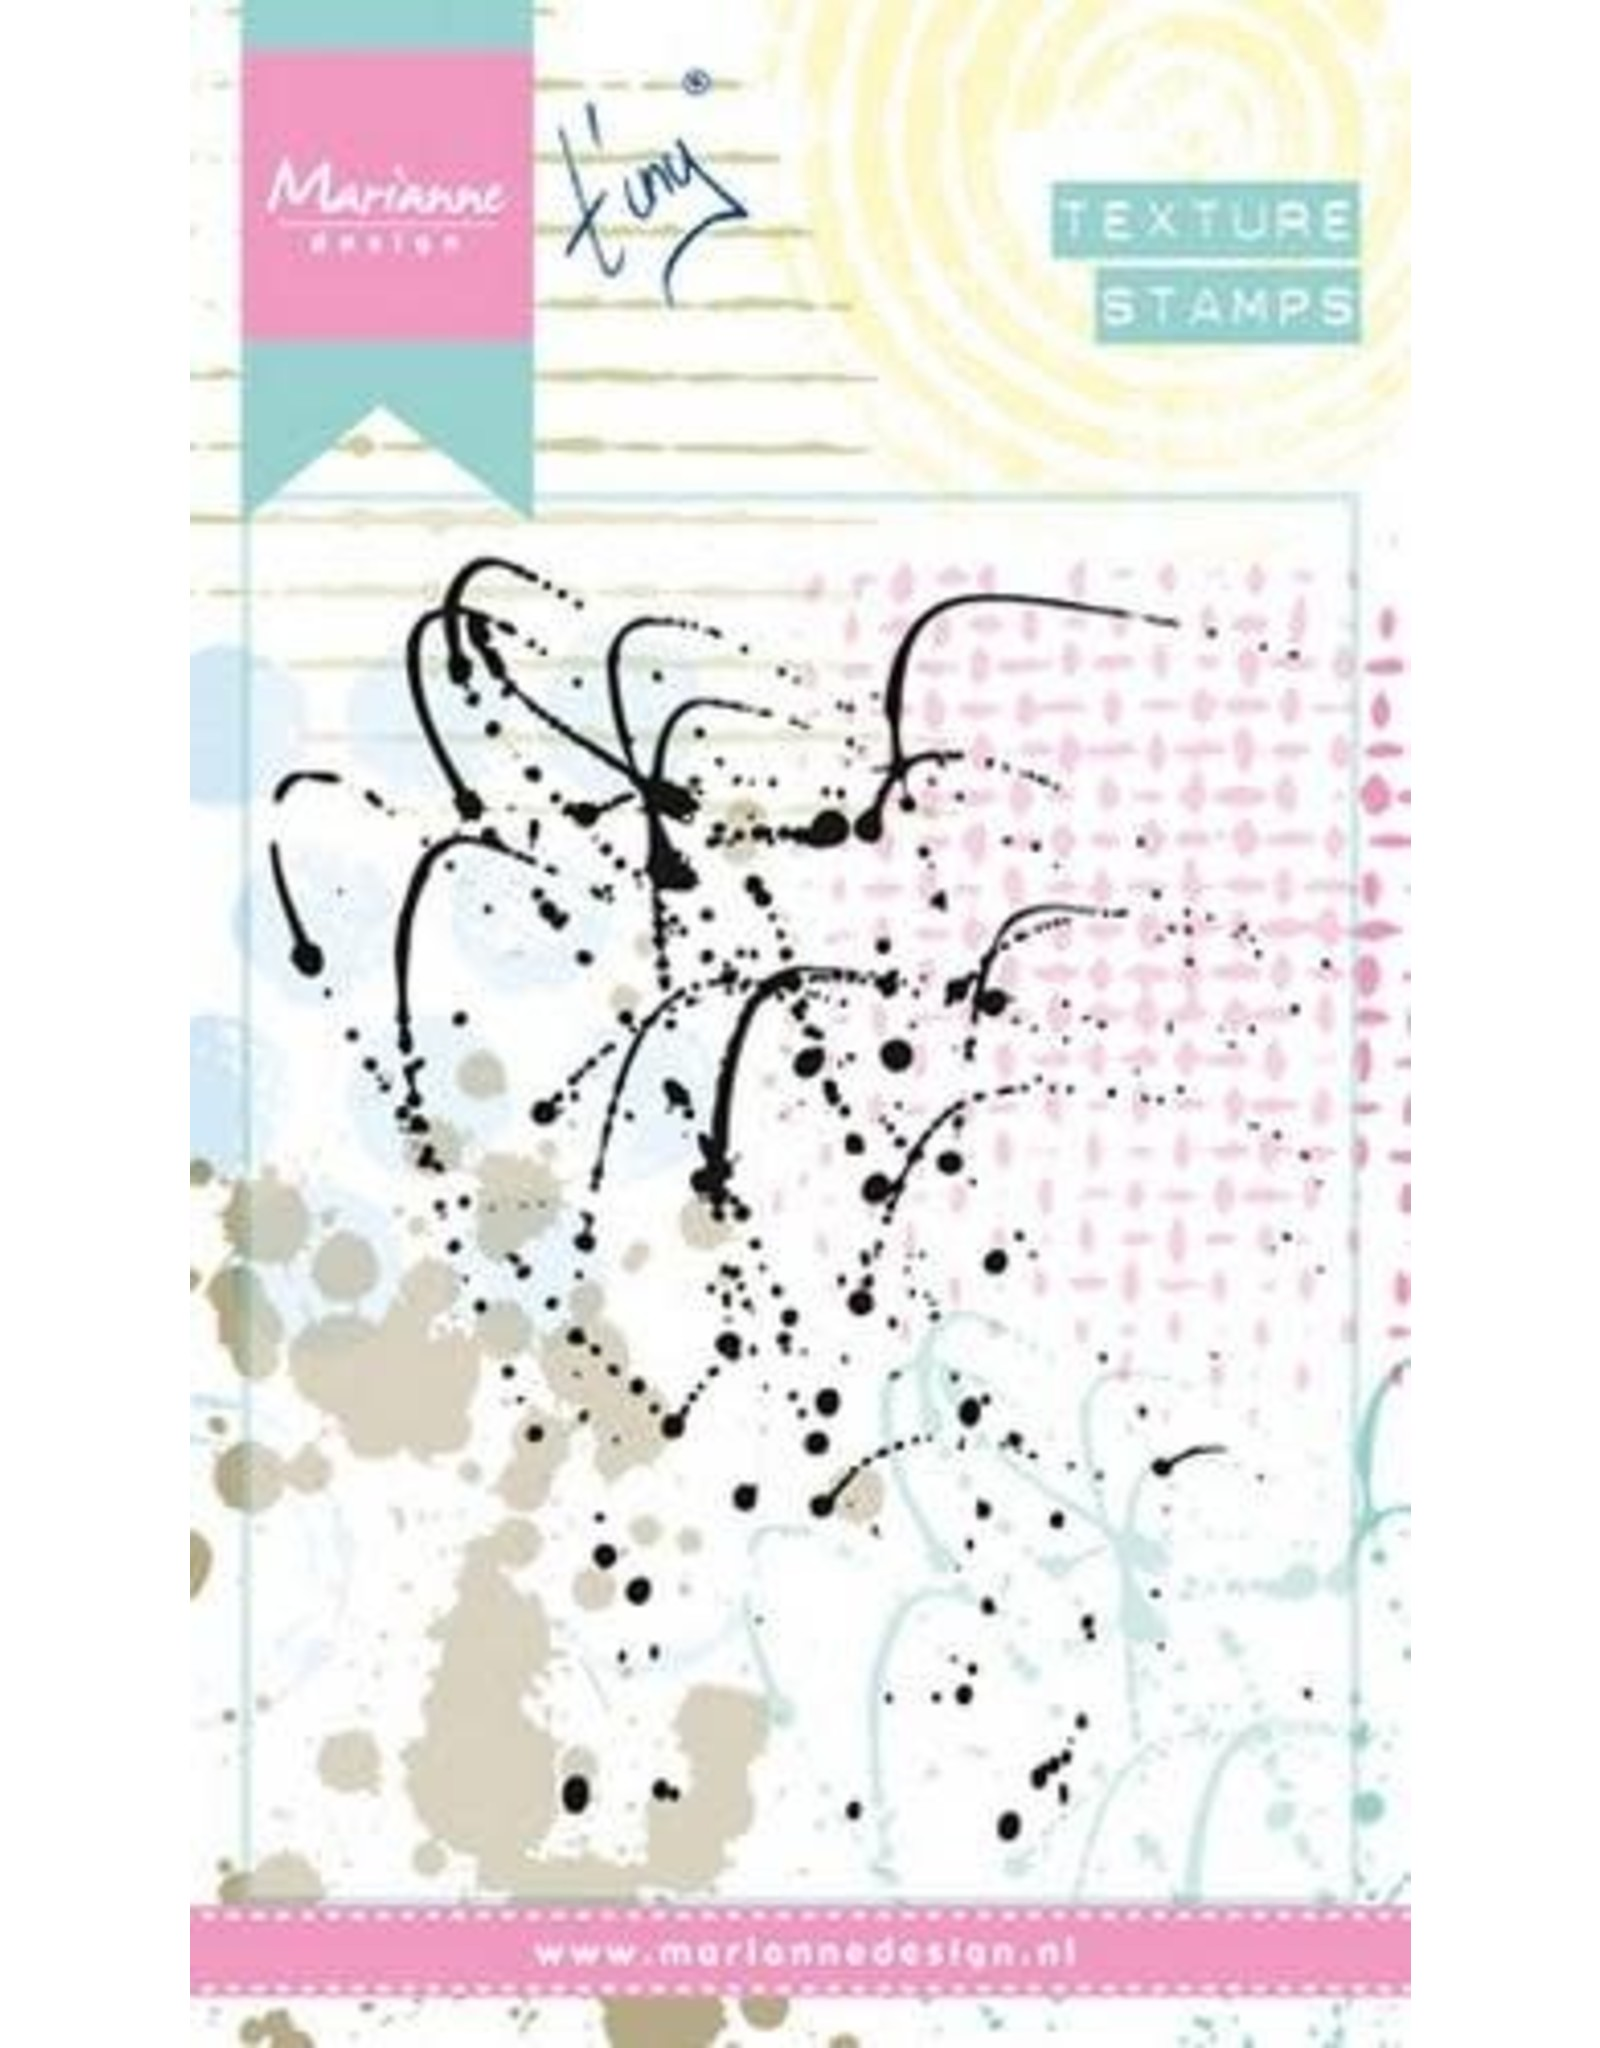 Marianne Design Marianne D Stempel Texture Splatters MM1607